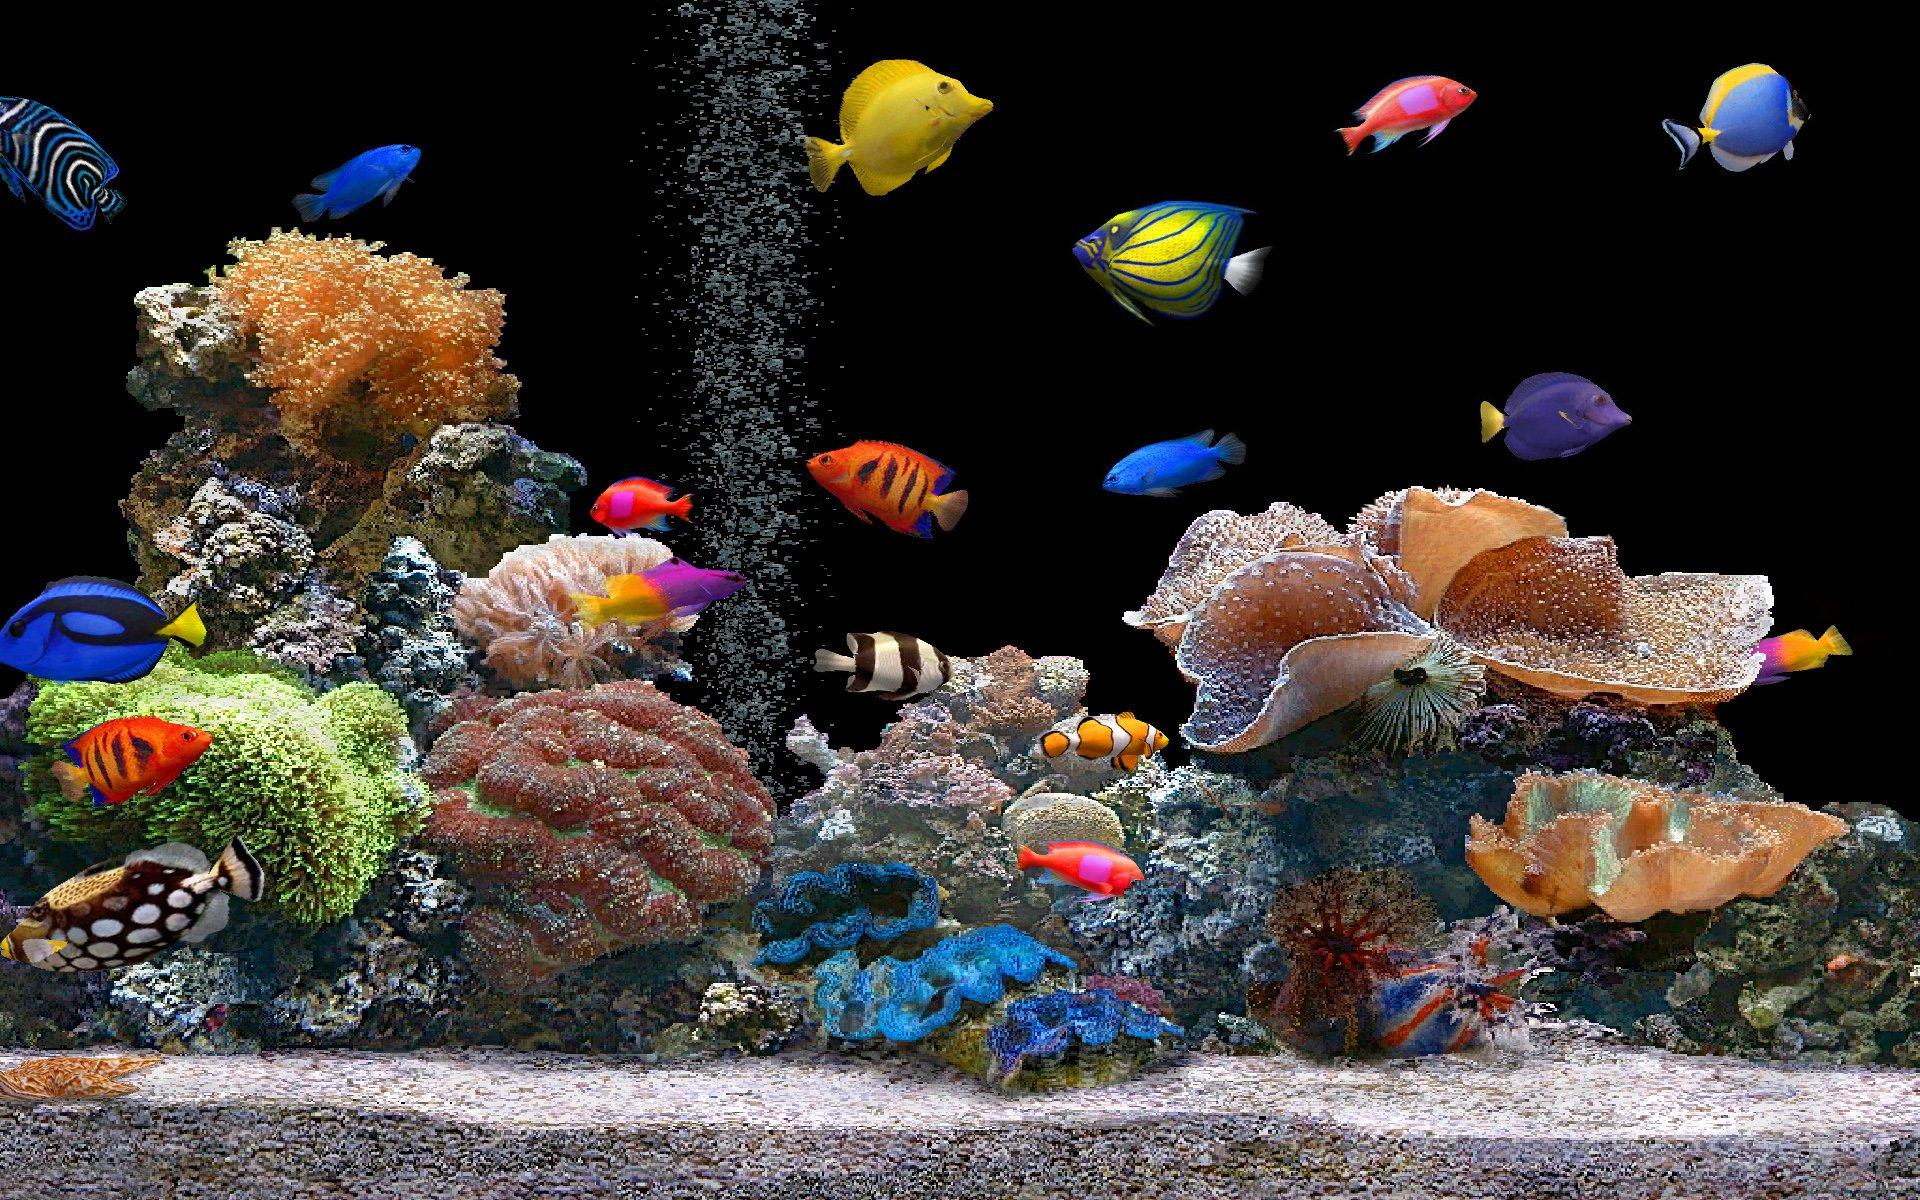 Aquarium live wallpaper for pc (55+ images).